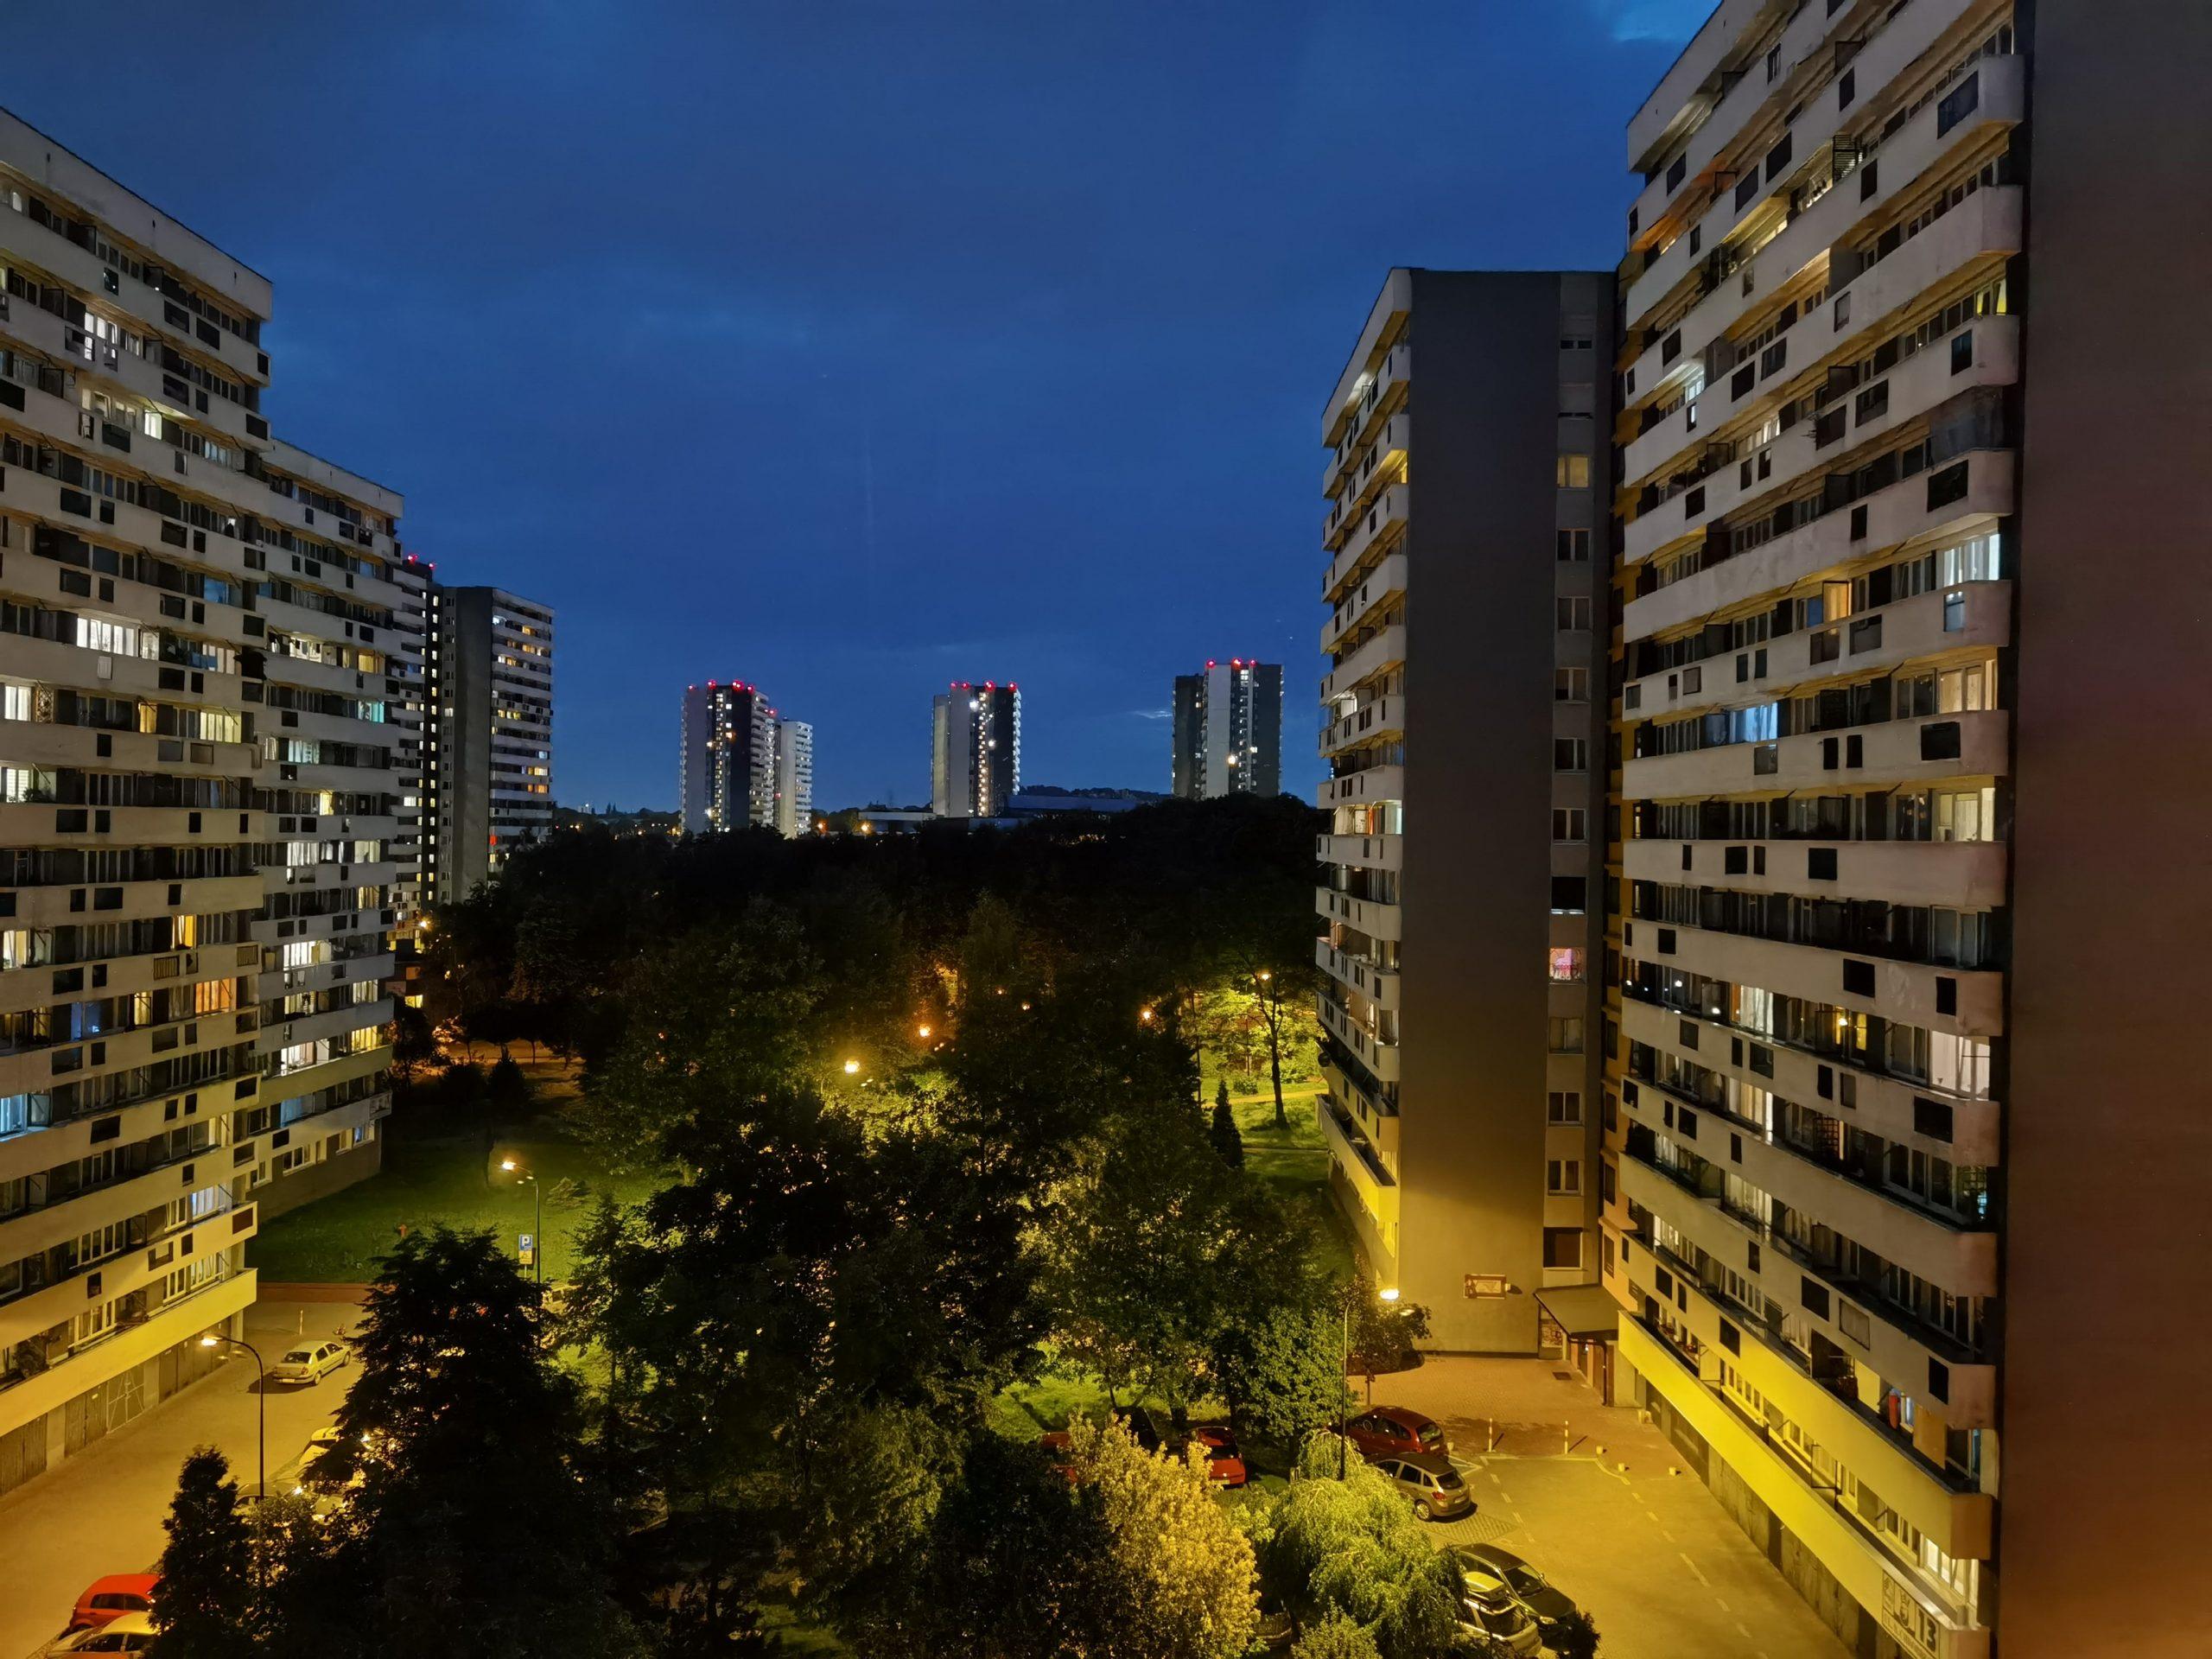 Zdjęcia nocne - Huawei P40 Pro